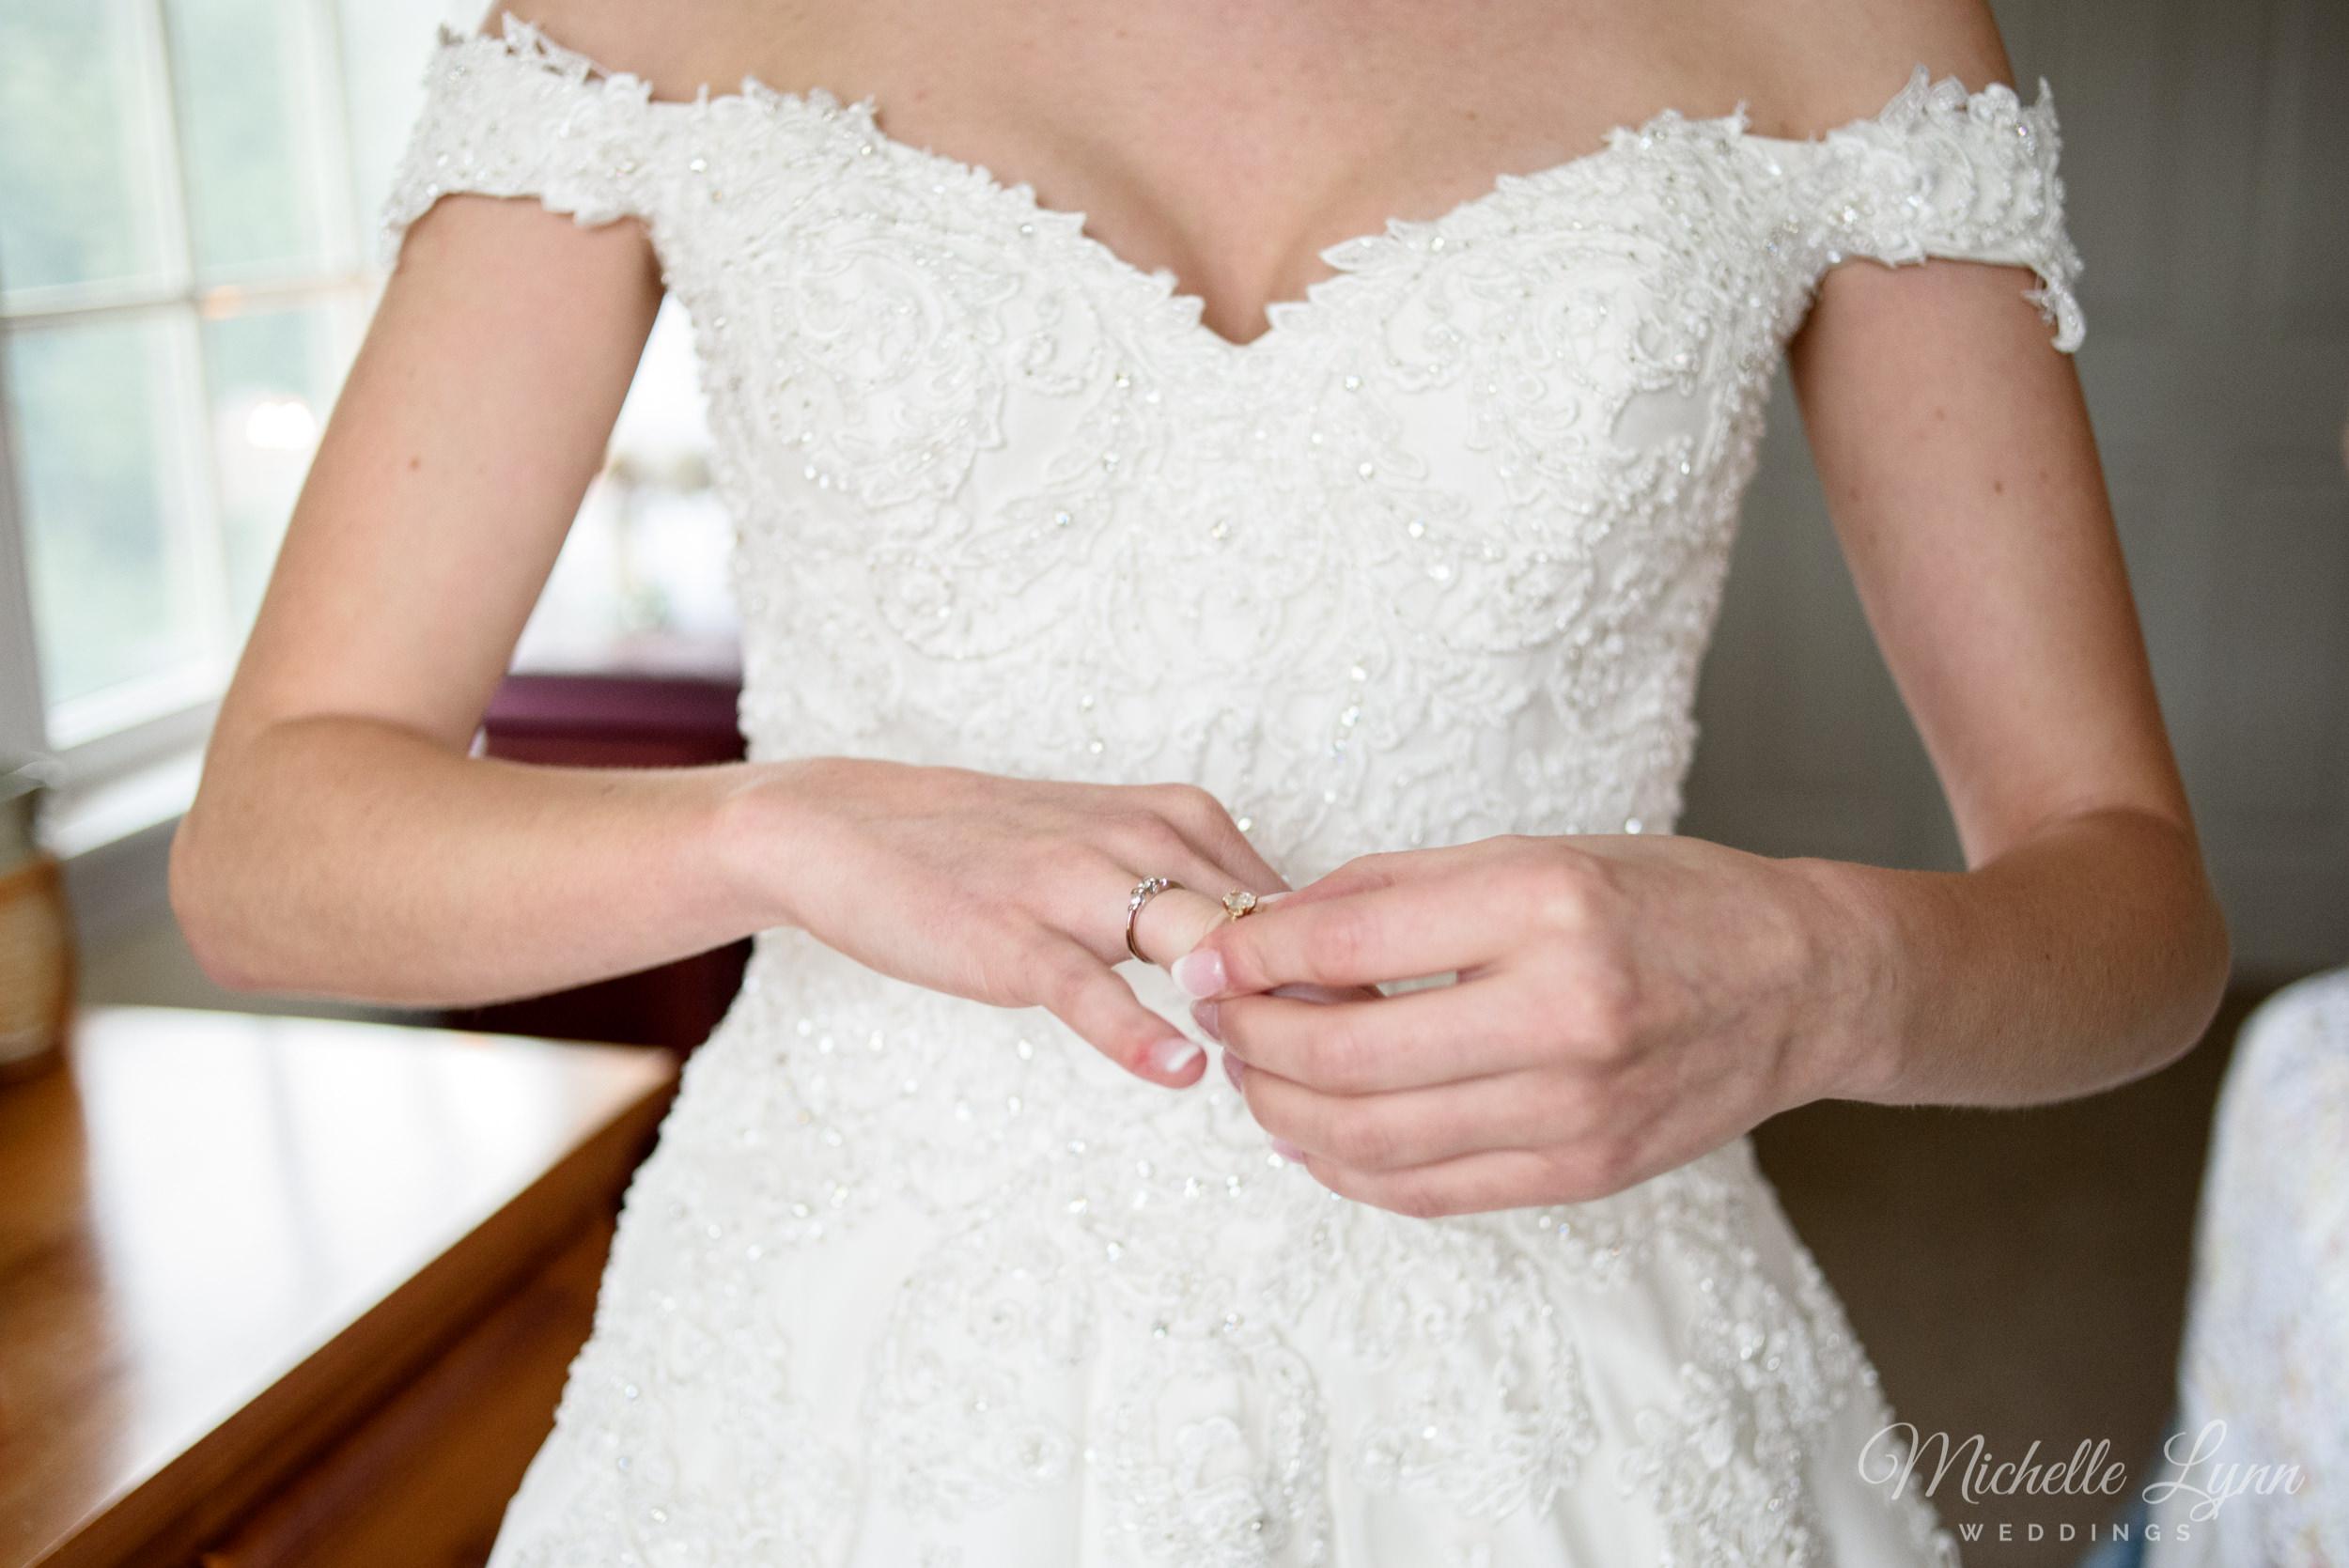 william-penn-inn-wedding-photography-mlw-15.jpg